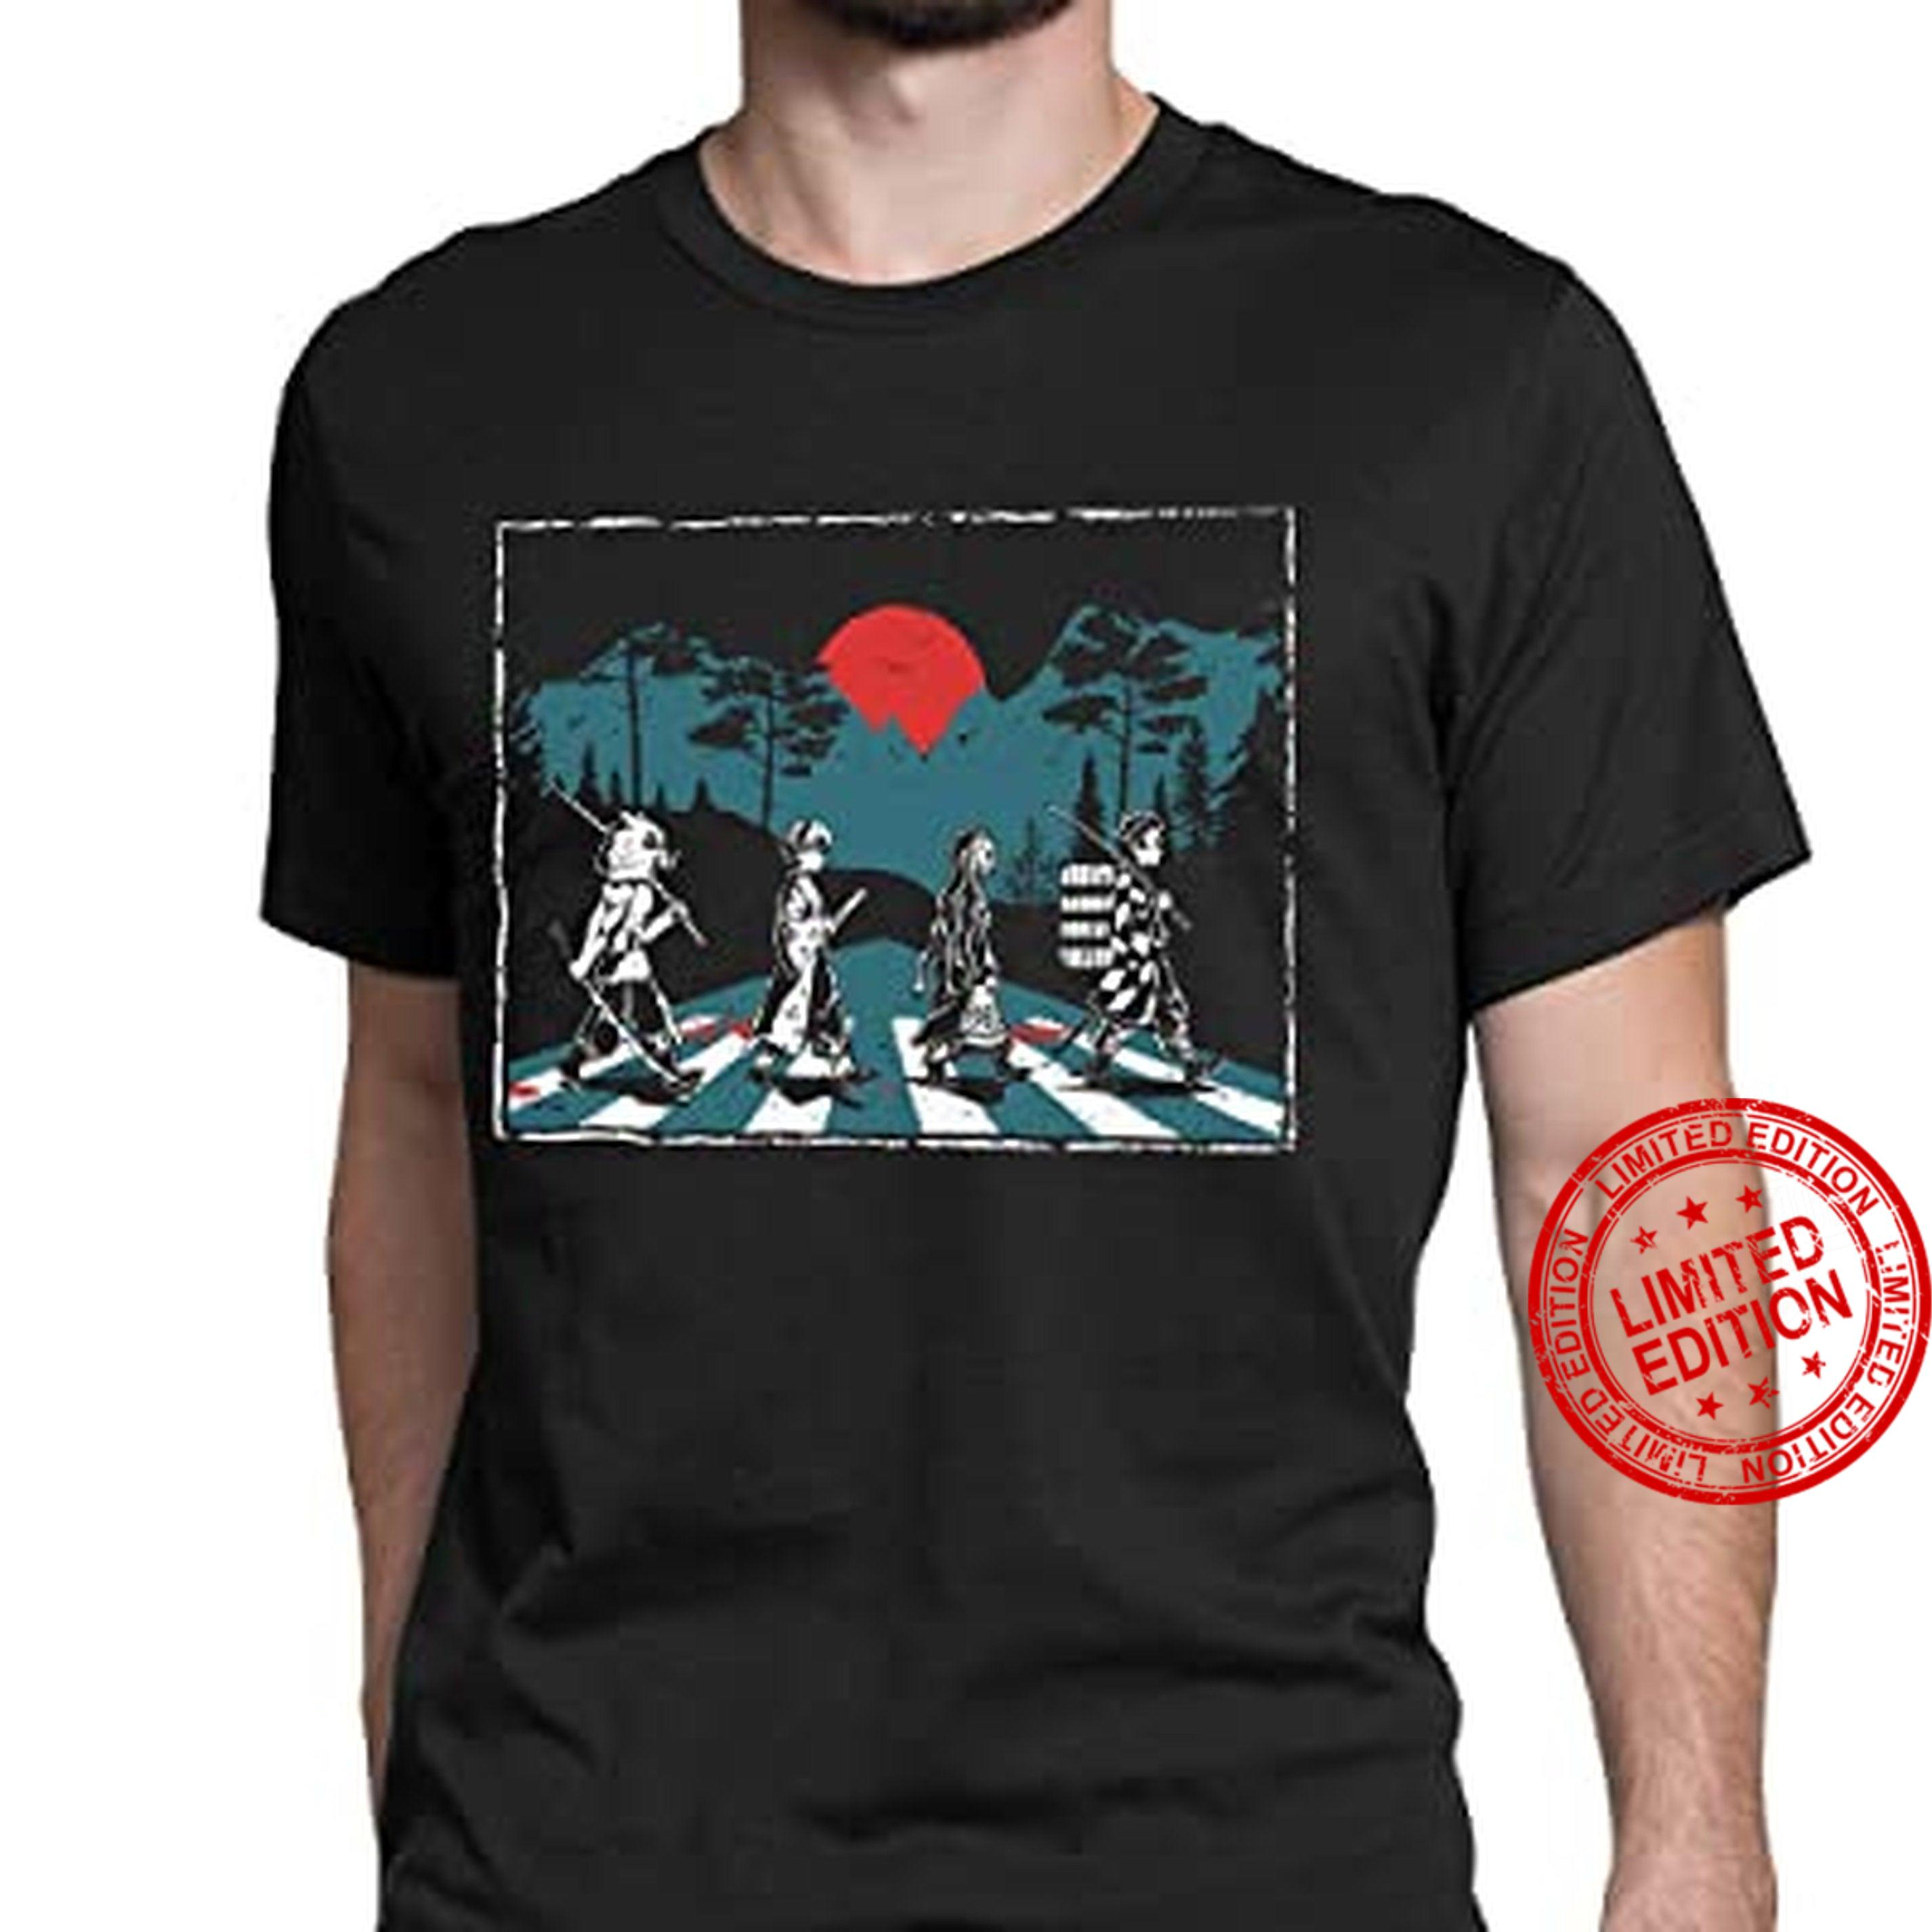 The Vintage Demon With Retro Shirt